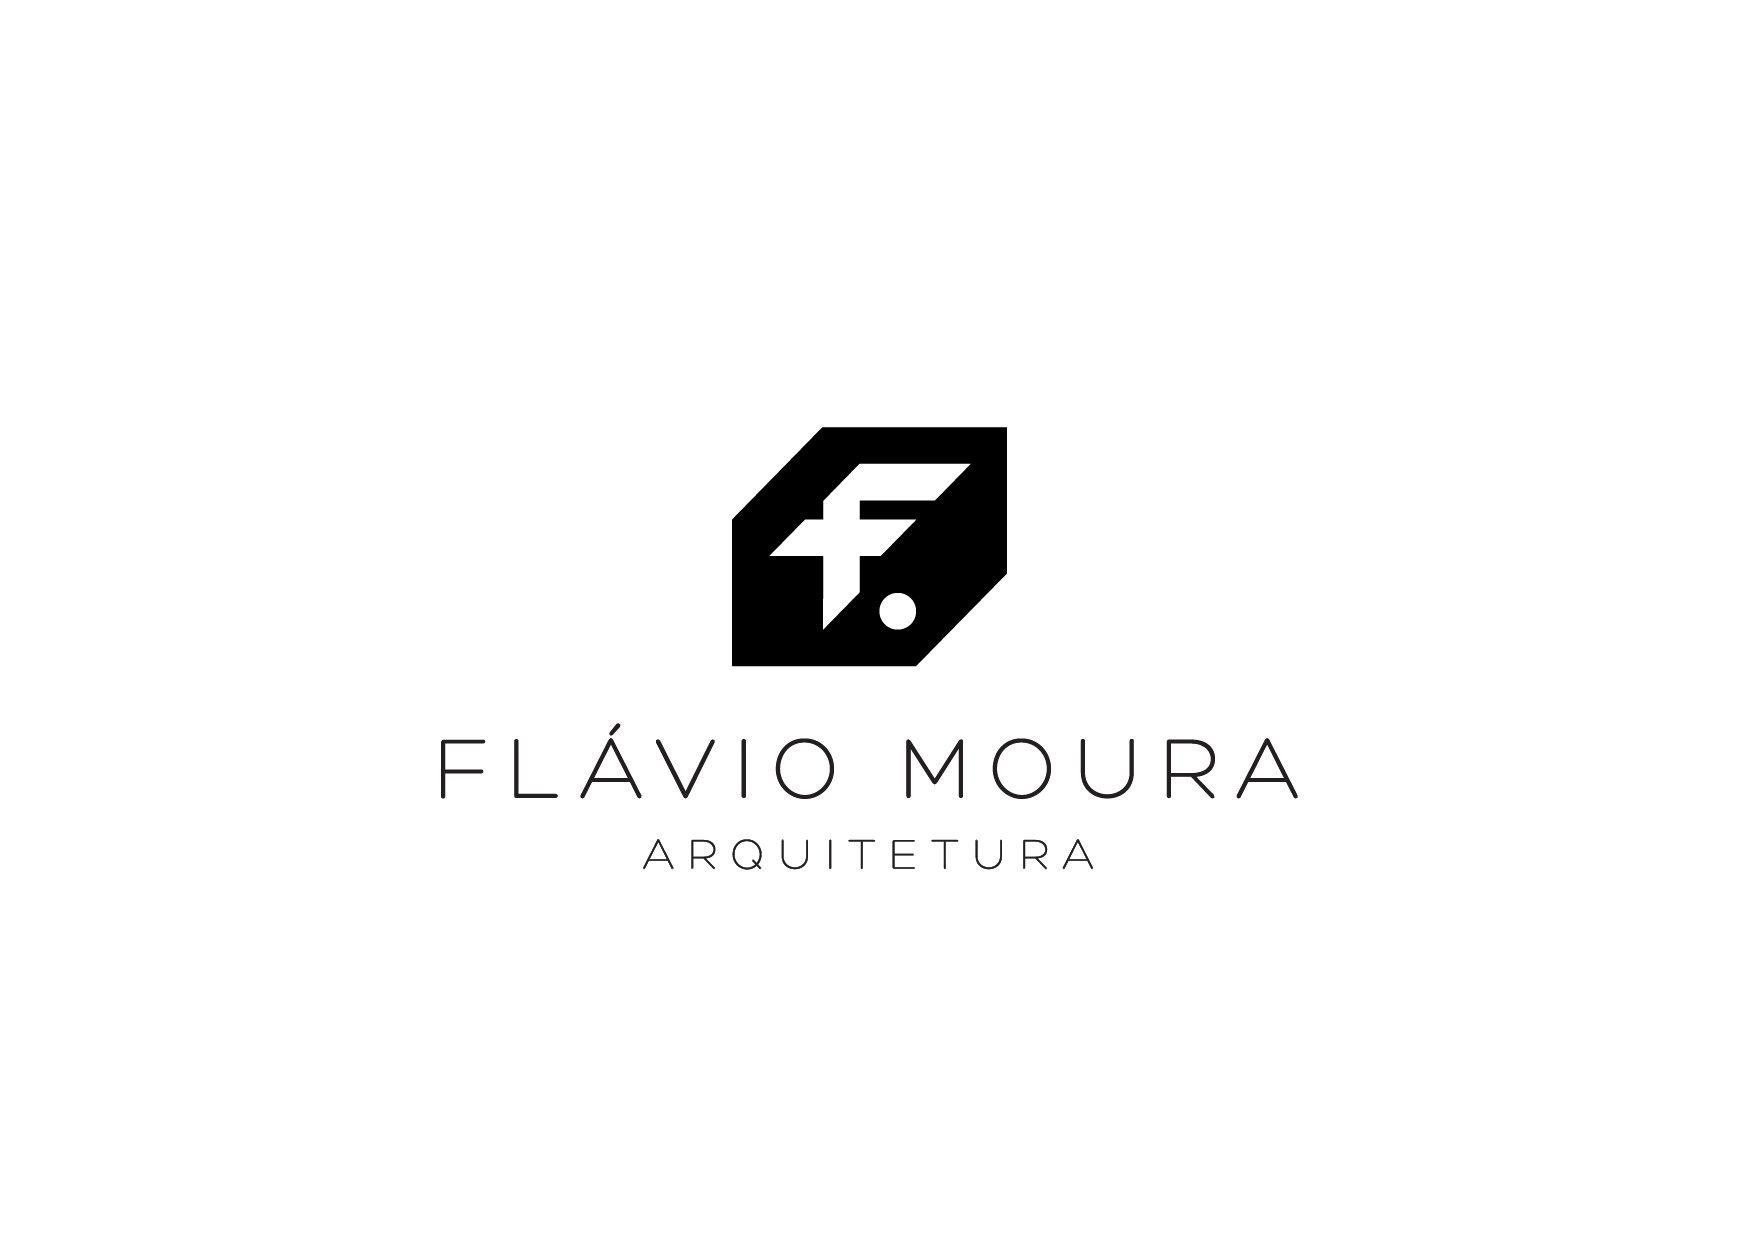 flavio-moura-arquitetura-marca